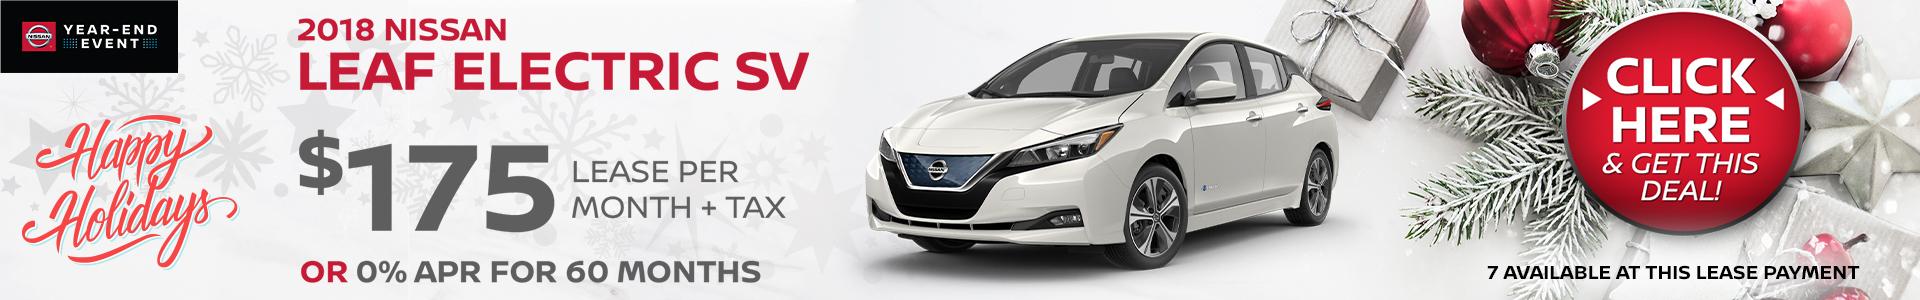 Mossy Nissan - Nissan LEAF $175 Lease